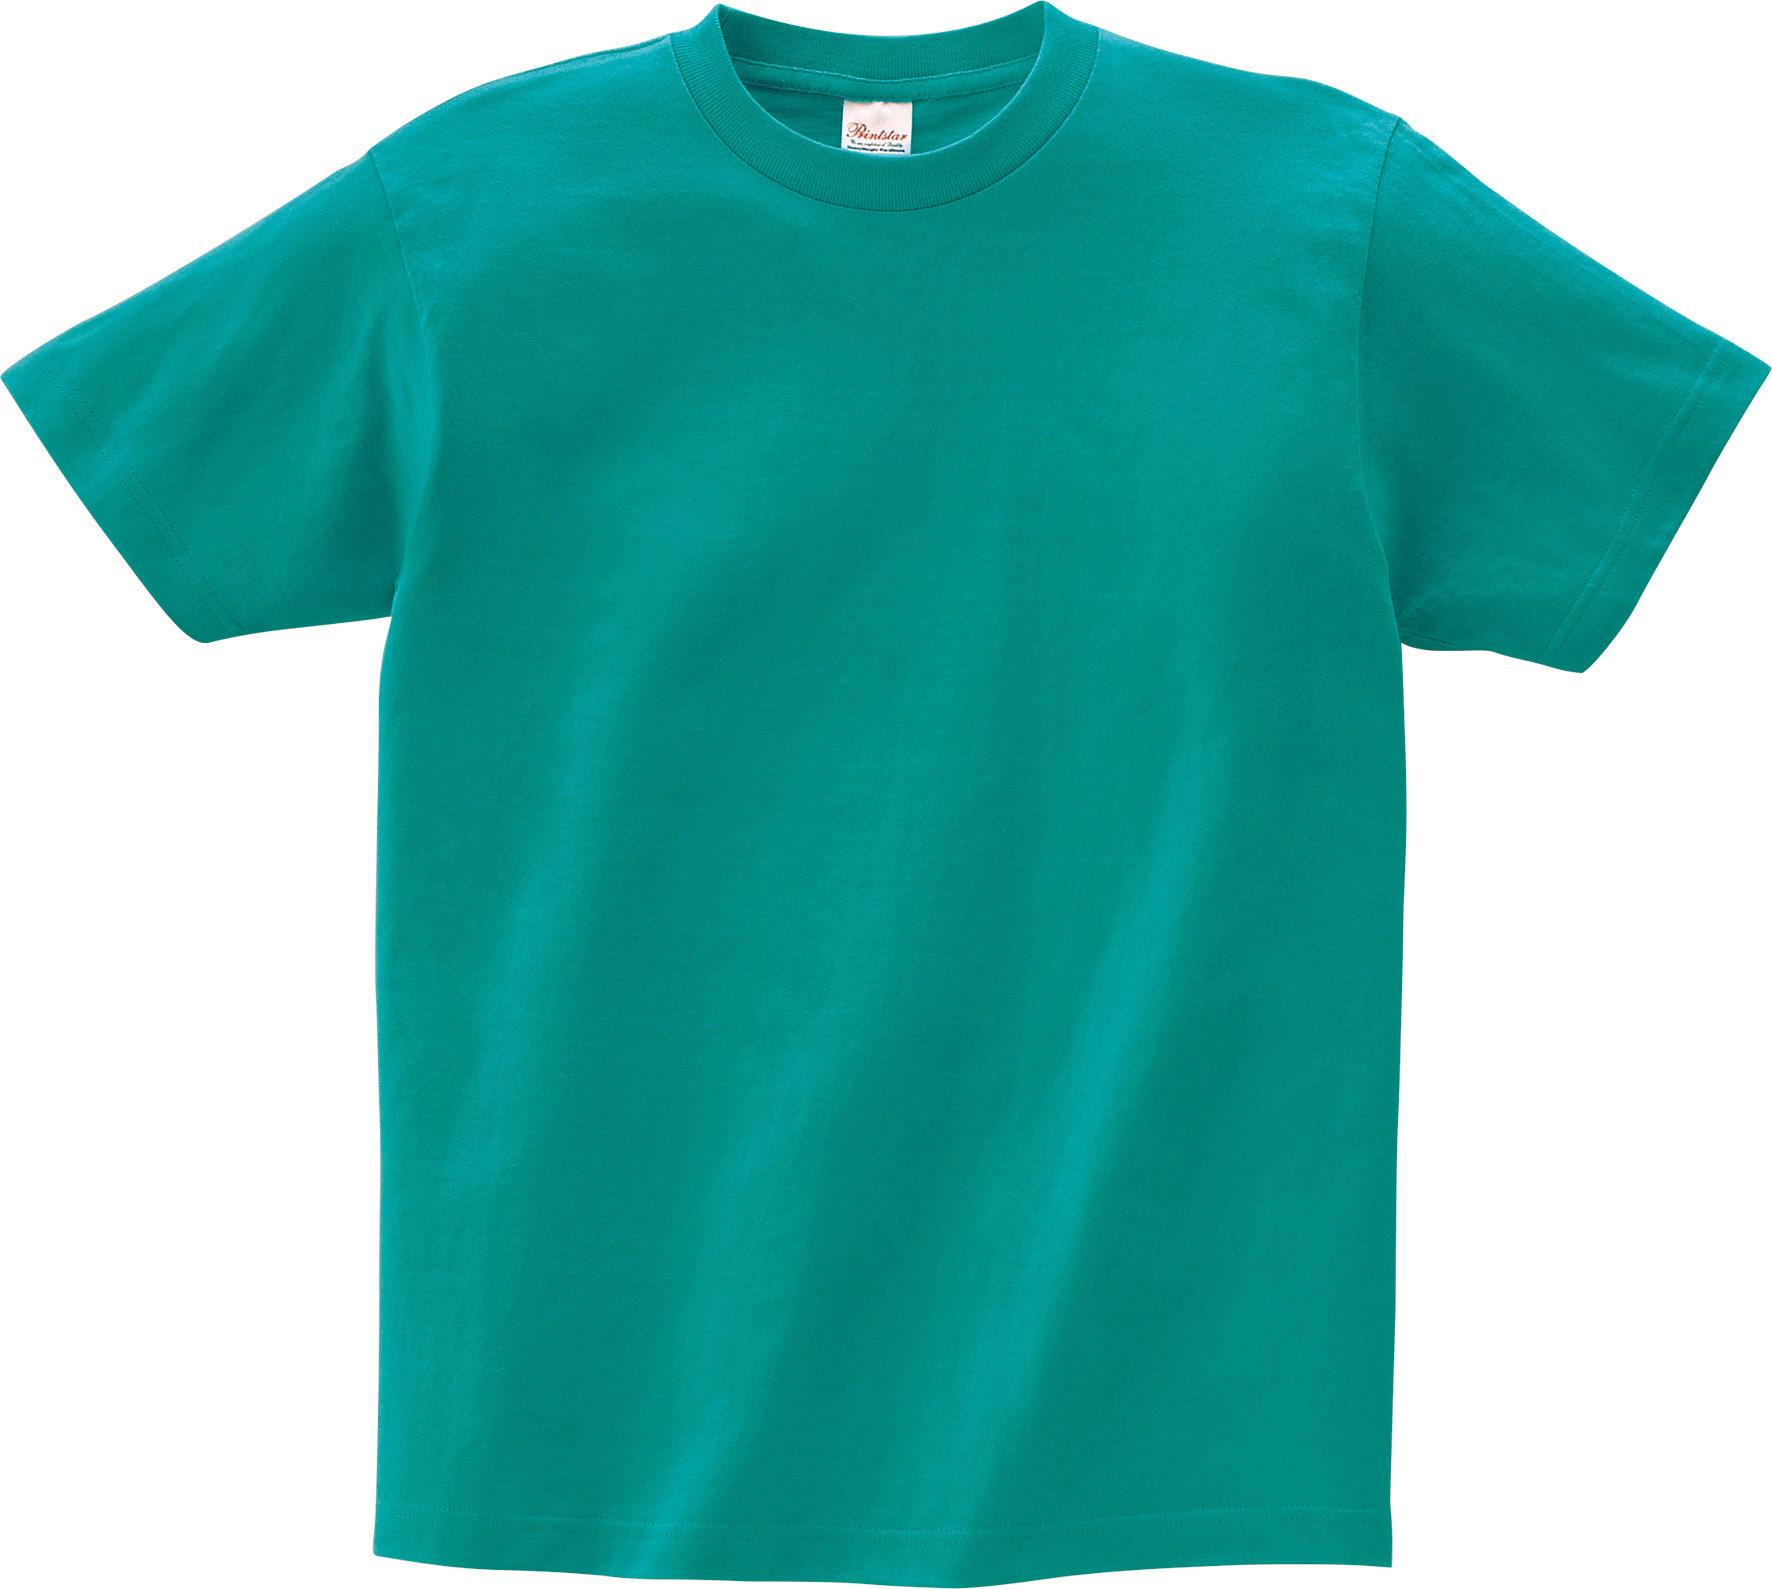 00085-CVT 5.6オンス・ヘビーウェイトTシャツ - 197-ピーコックグリーン, XXXL